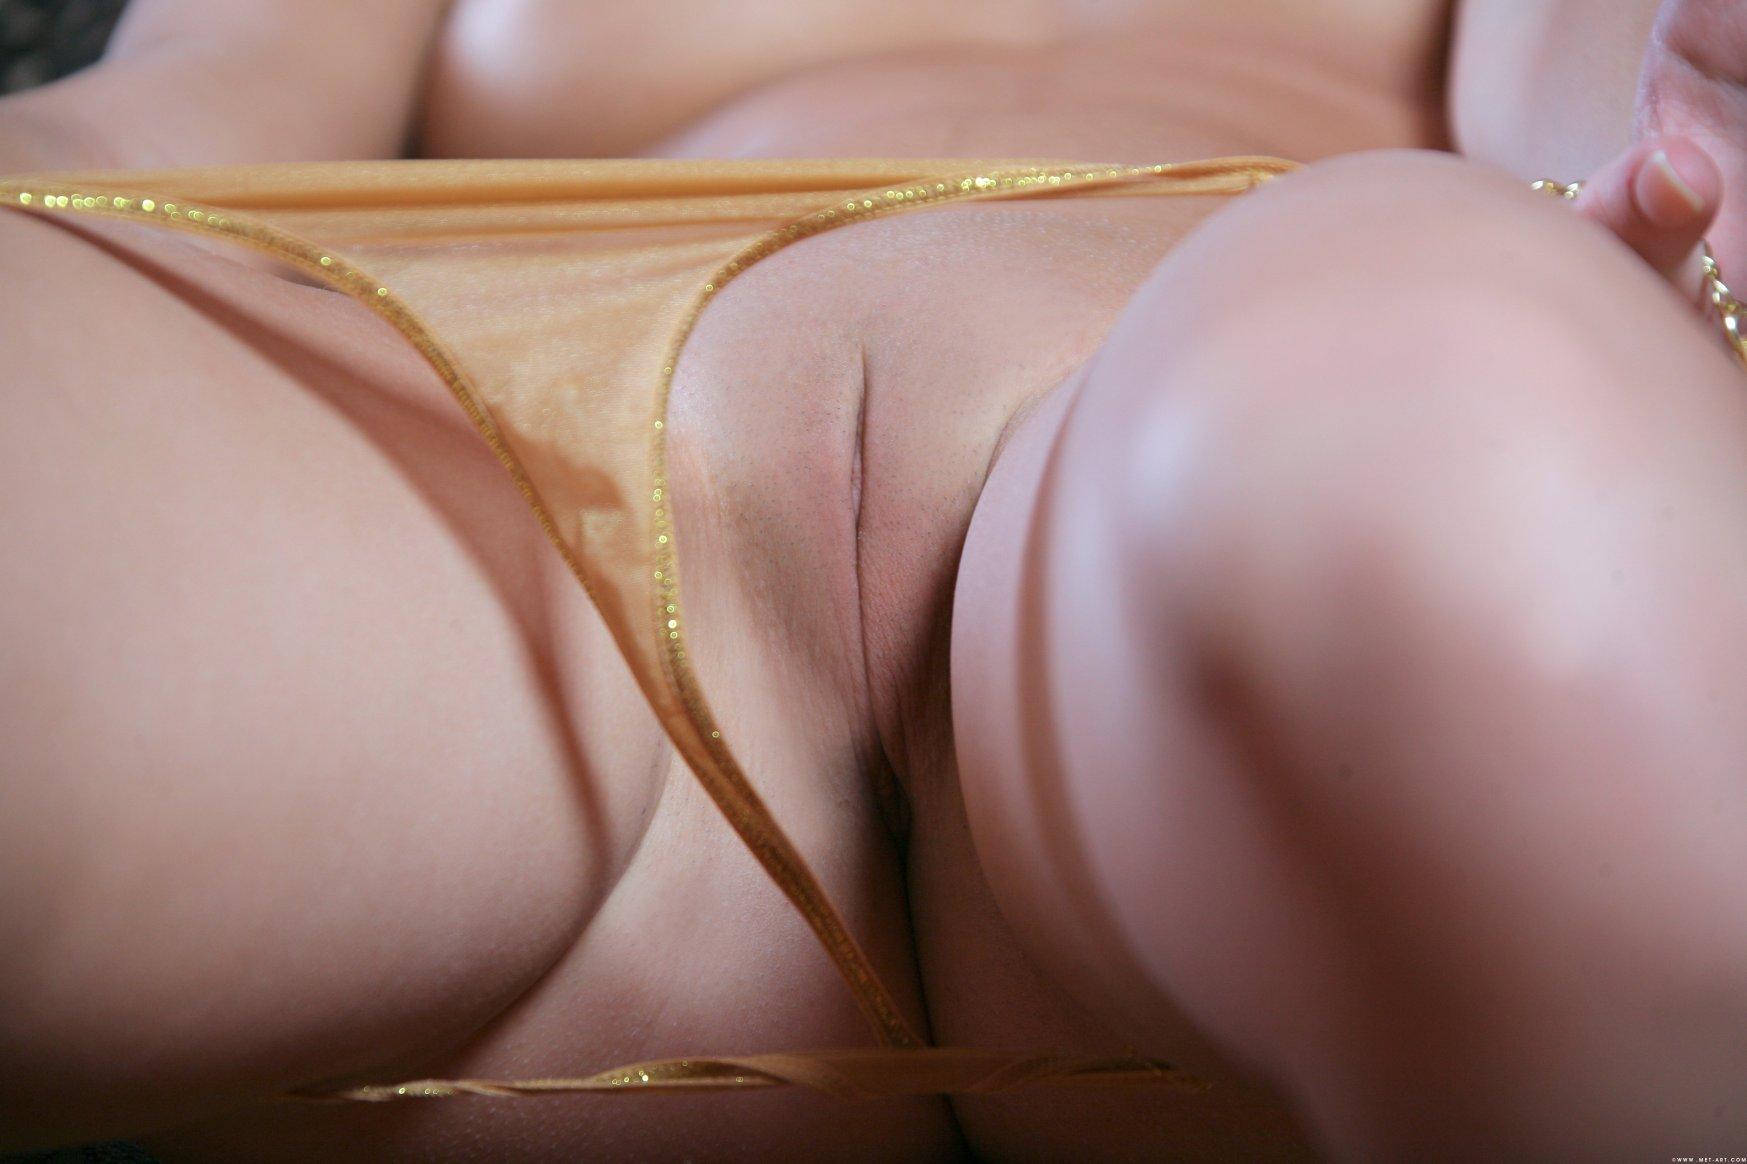 pussys-close-up-vol8-32